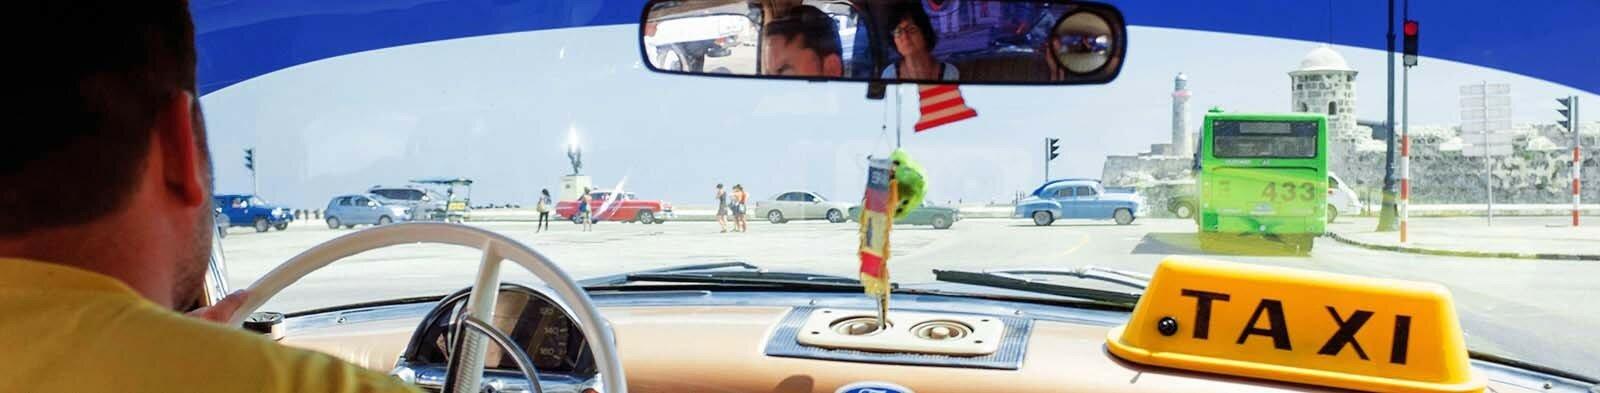 Taxi driver in Havana / Cuba